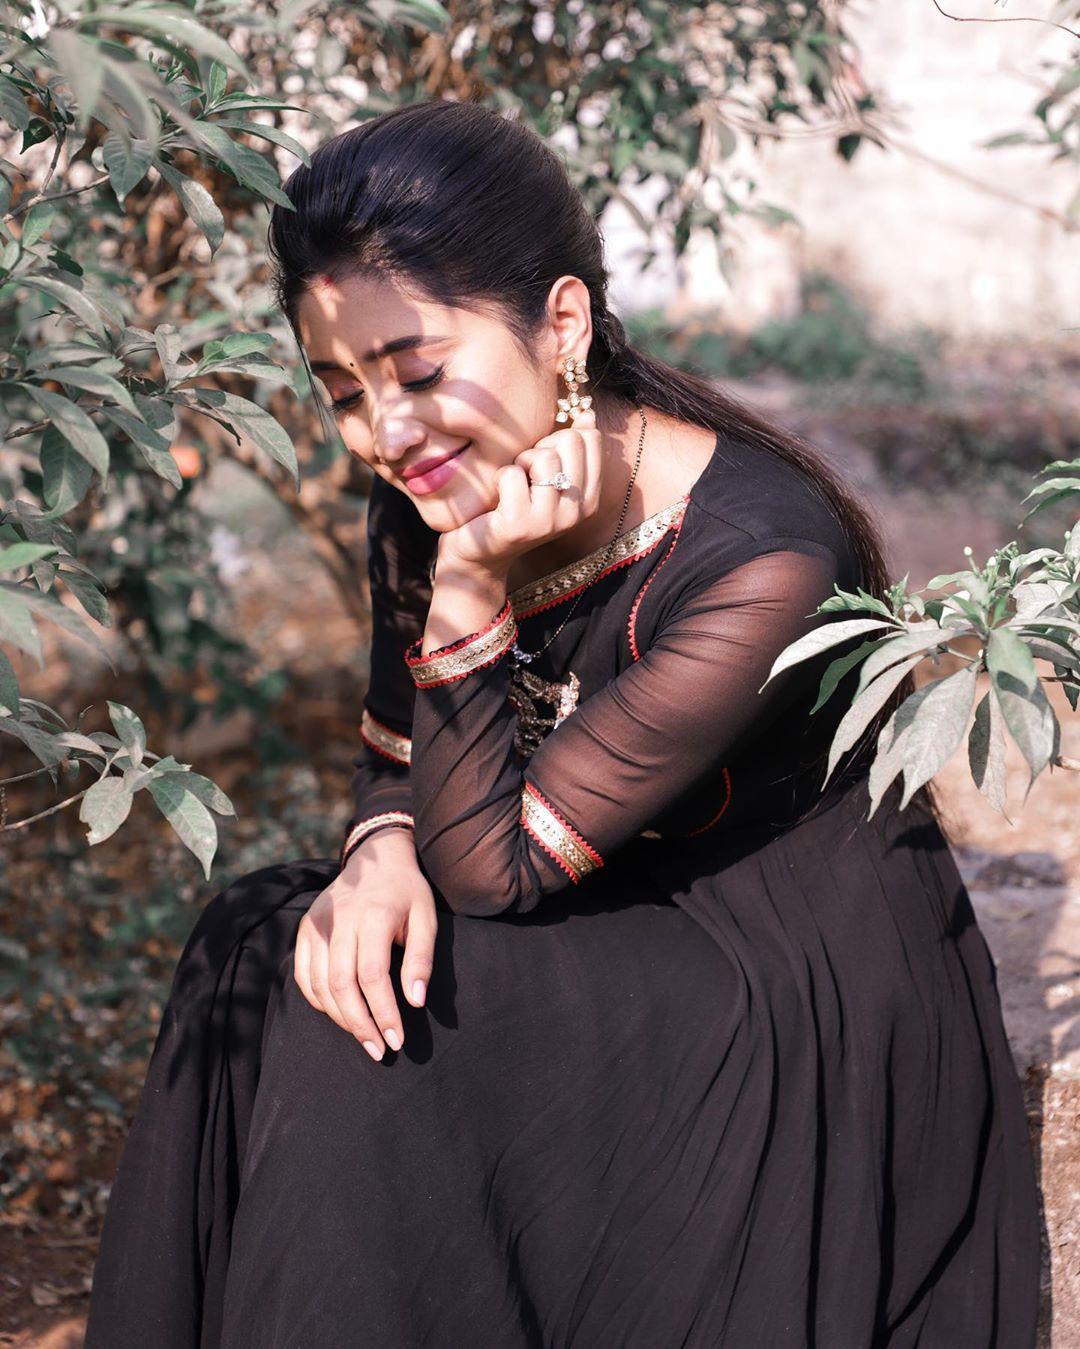 Shivangi Joshi dress formal wear colour outfit ideas 2020, girls photoshoot